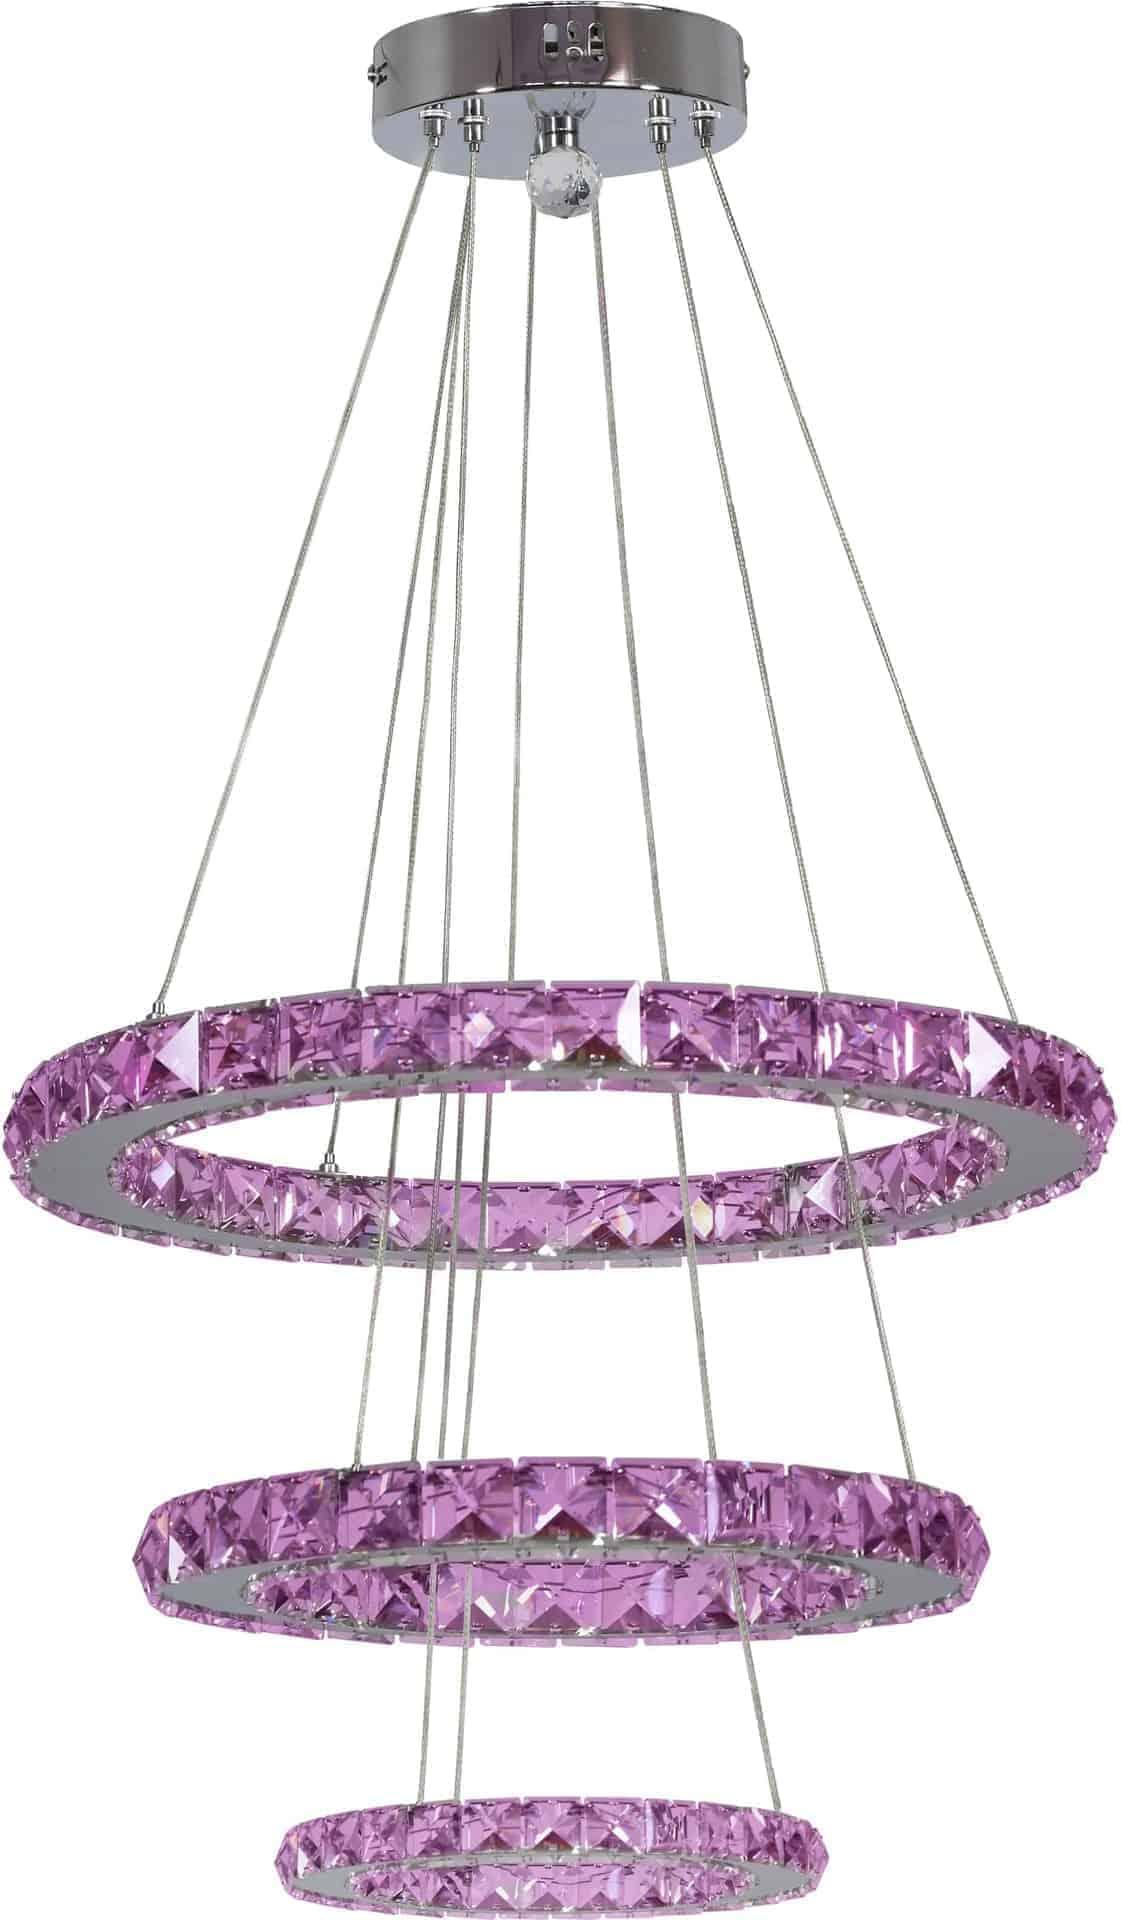 Pendul cristal LED Candellux Lords, 48W, crom-transparent, dimabil, telecomanda